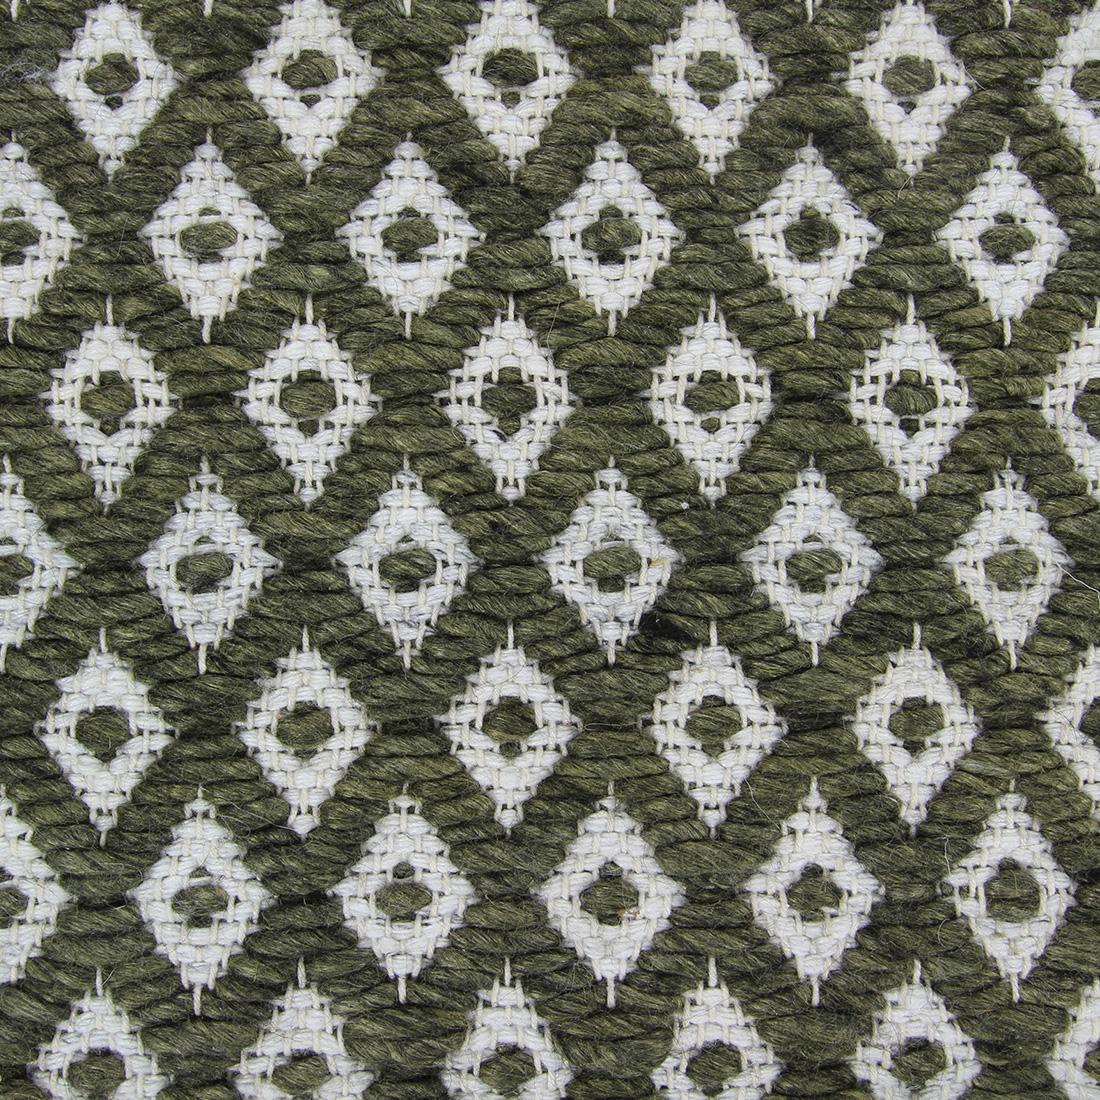 Vloerkleed Brinker Saint Army Green | 170 x 230 cm